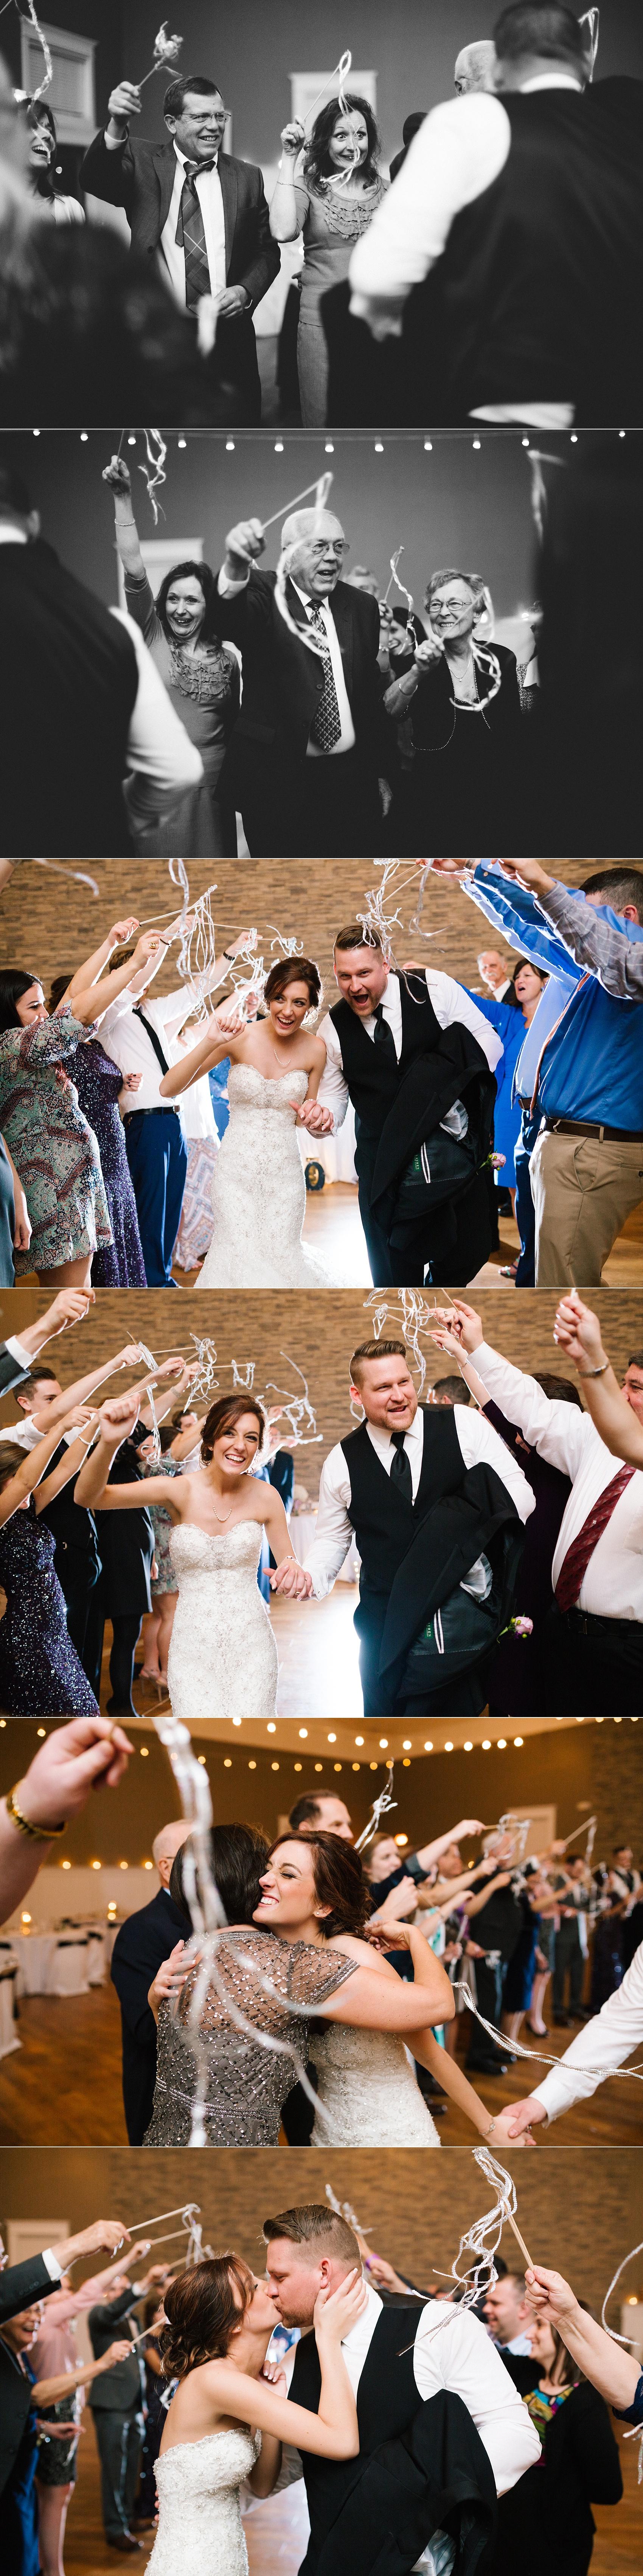 dwayne lydia delaware wedding philadelphia baltimore washingtion dc wedding photographer-33